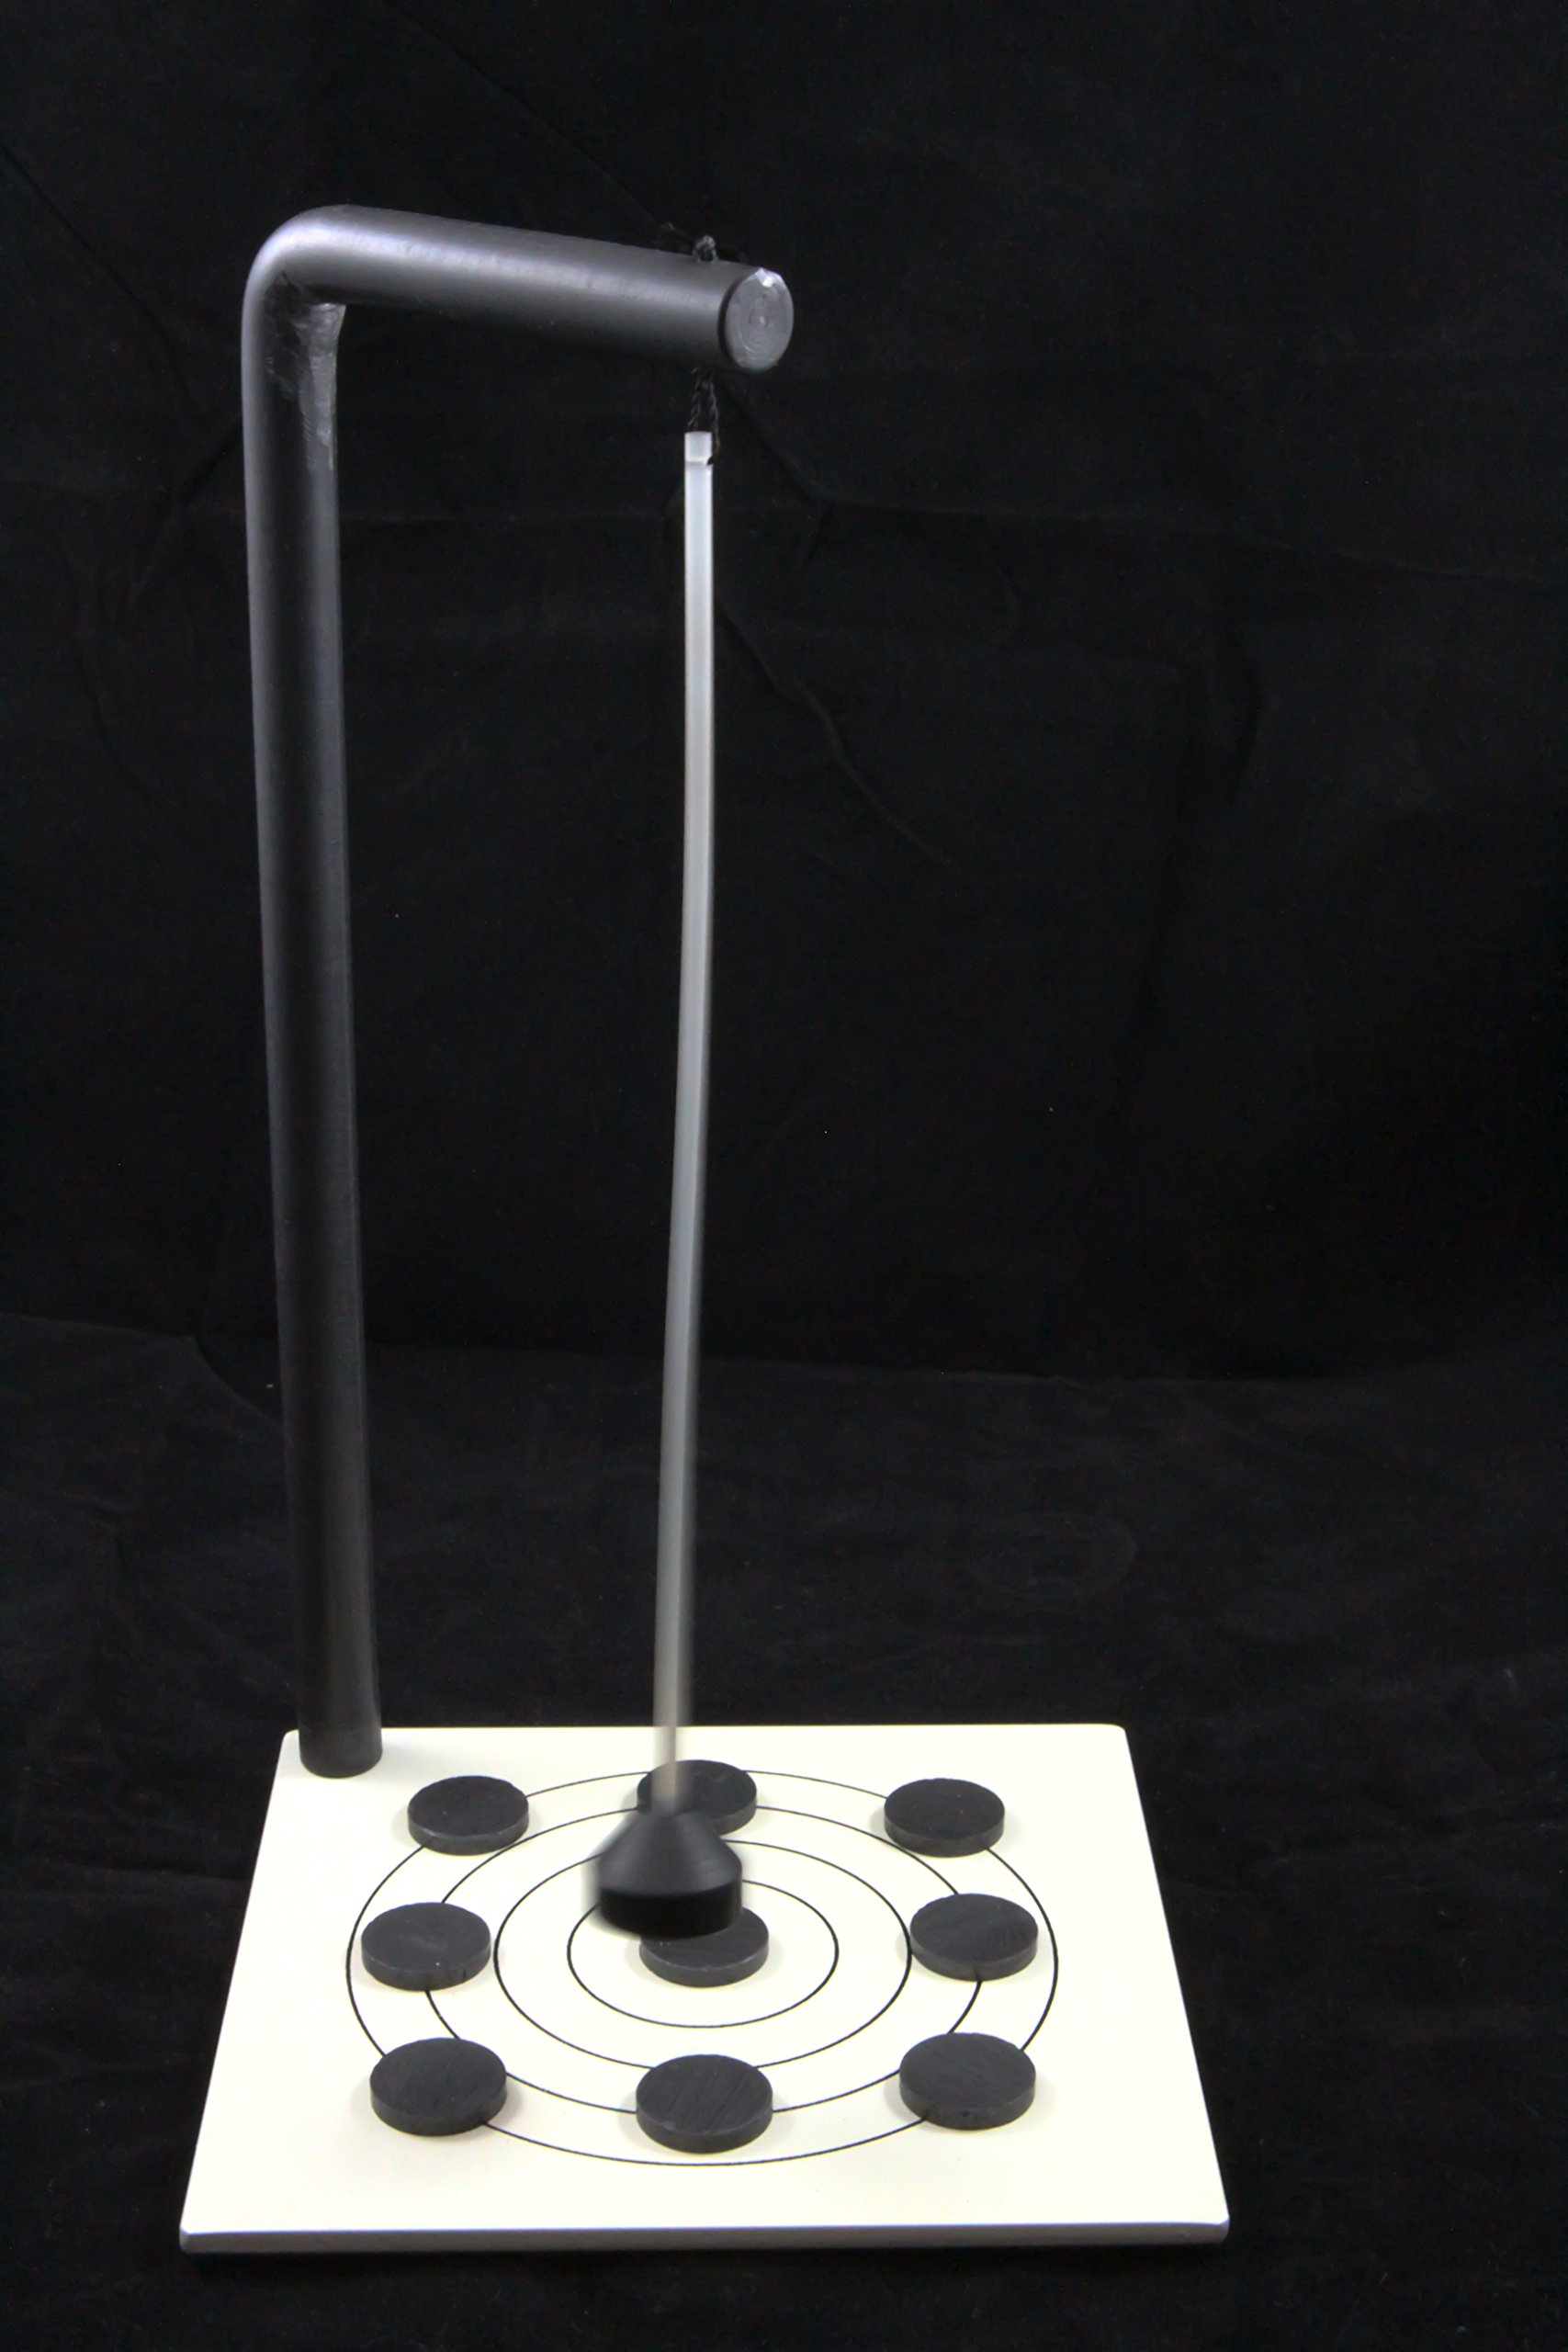 Randomly Oscillating Magnetic Pendulum (R.O.M.P.)